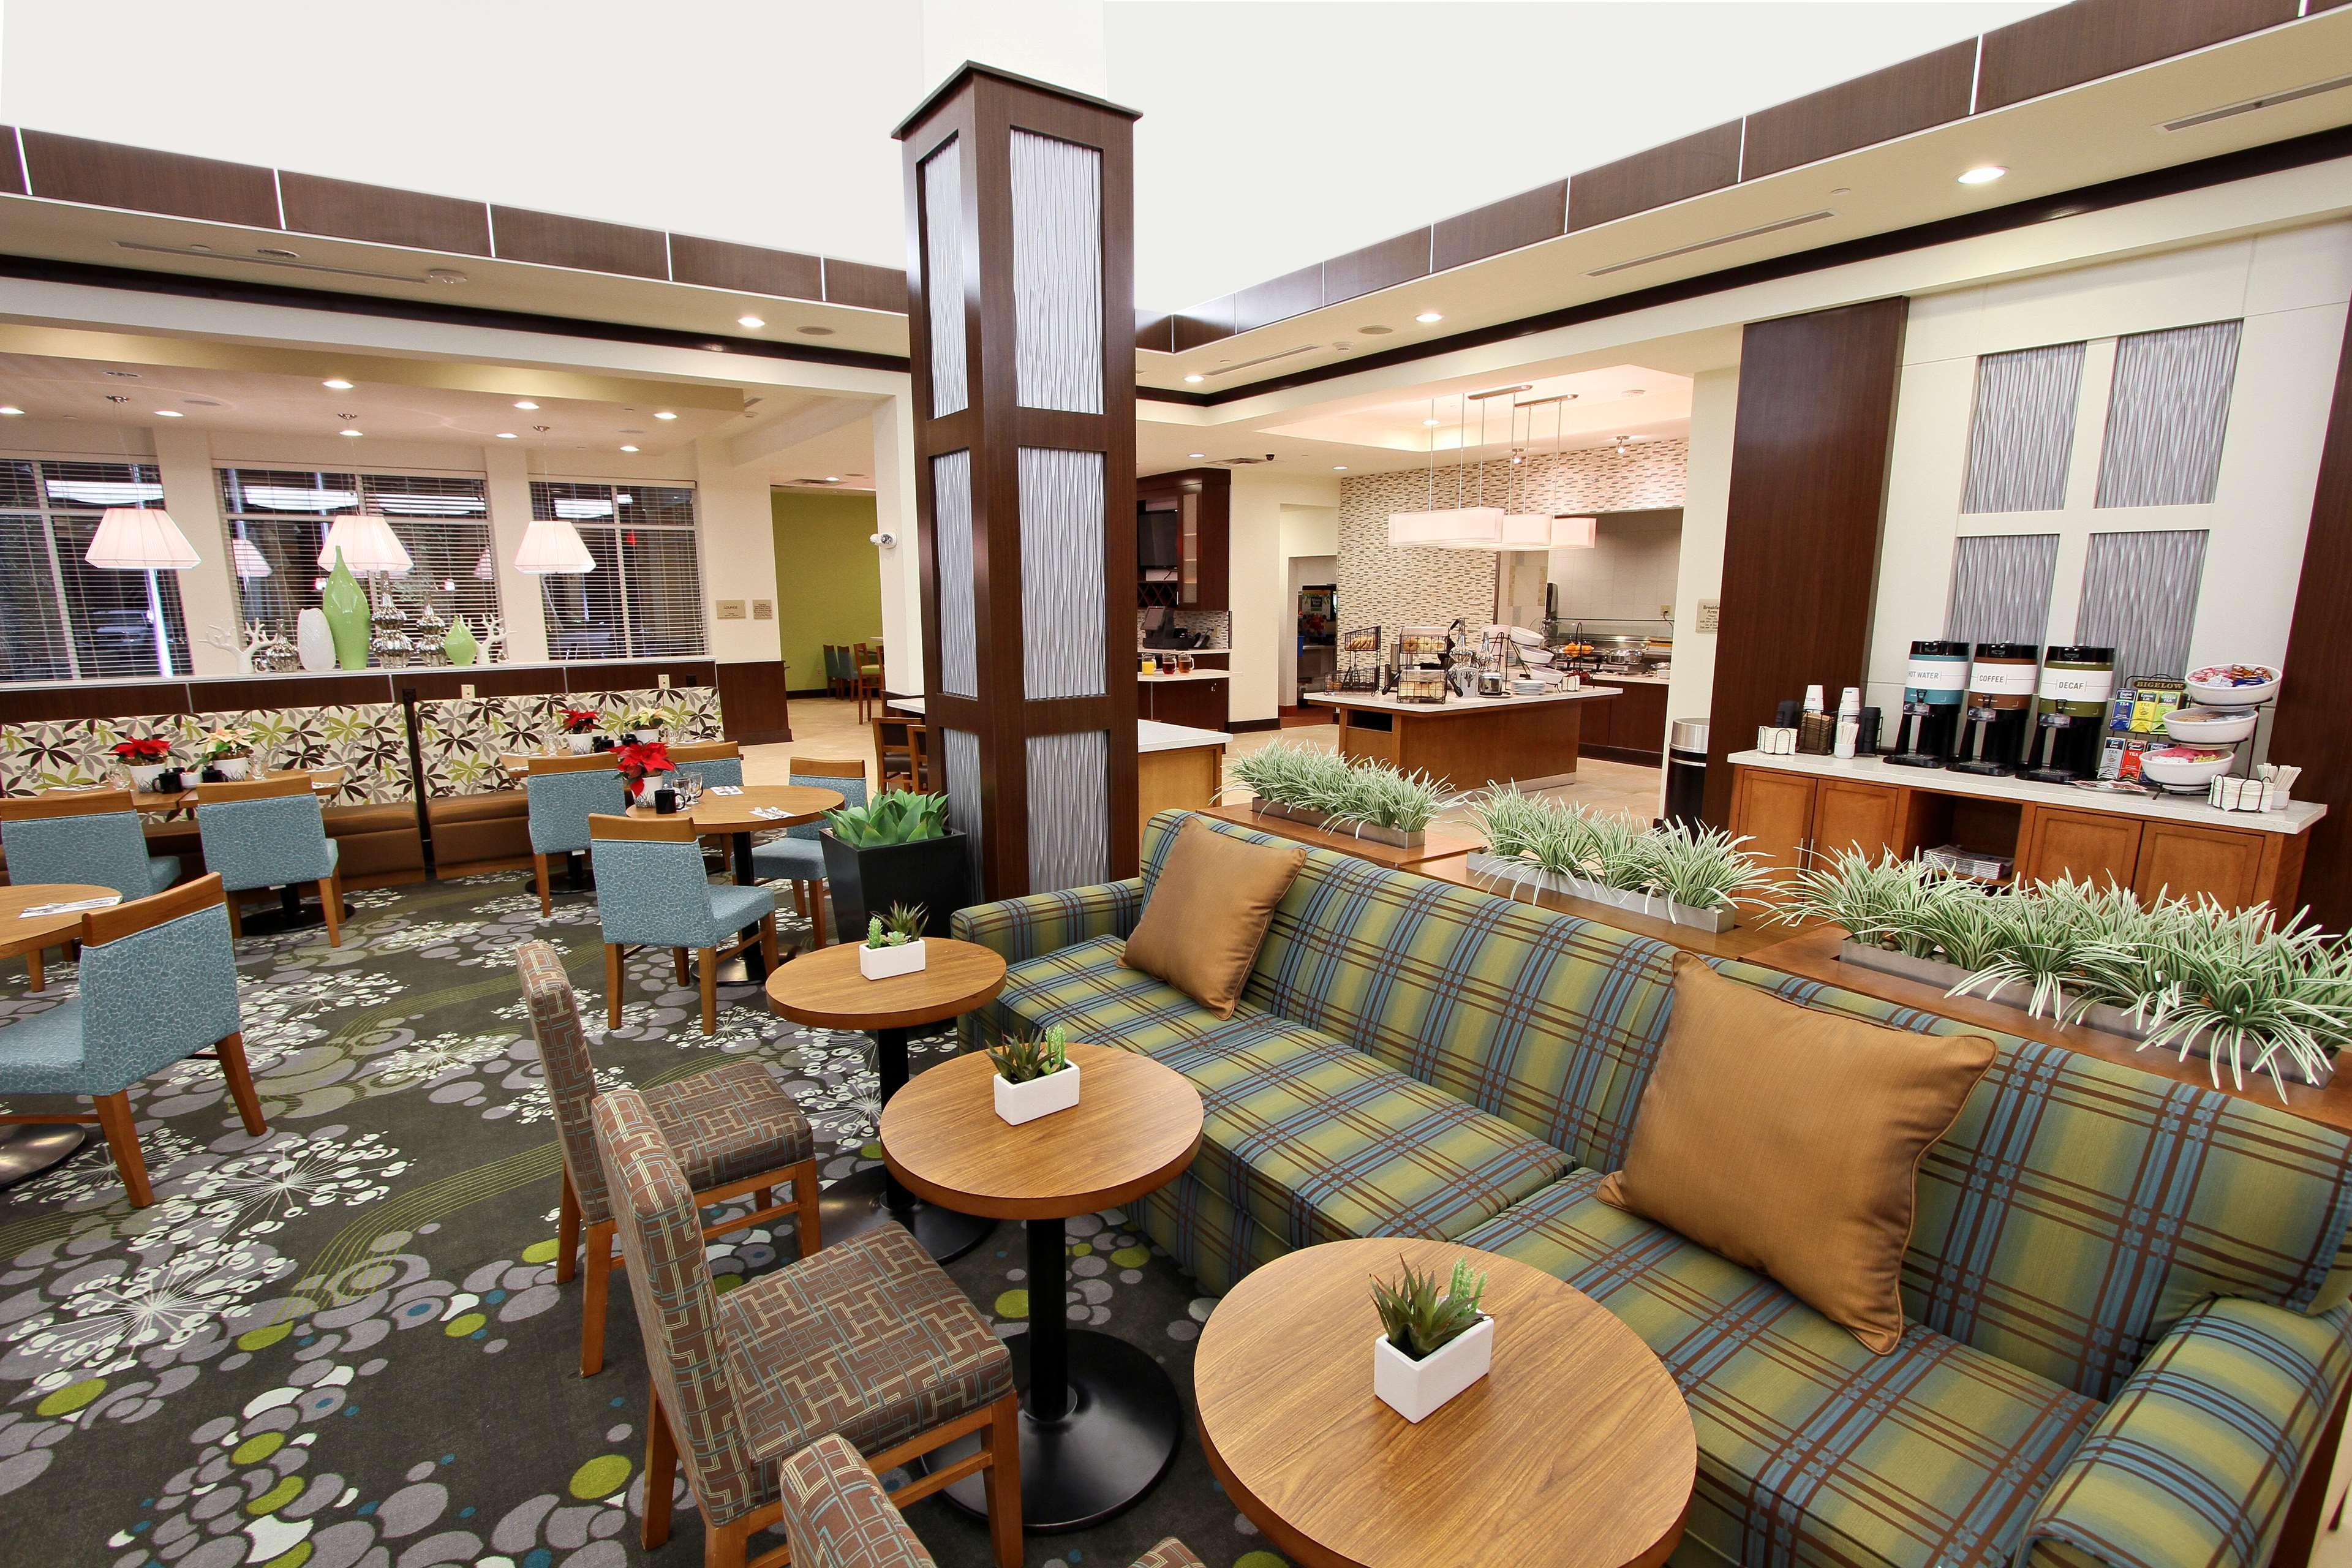 Hilton Garden Inn Covington/Mandeville image 3